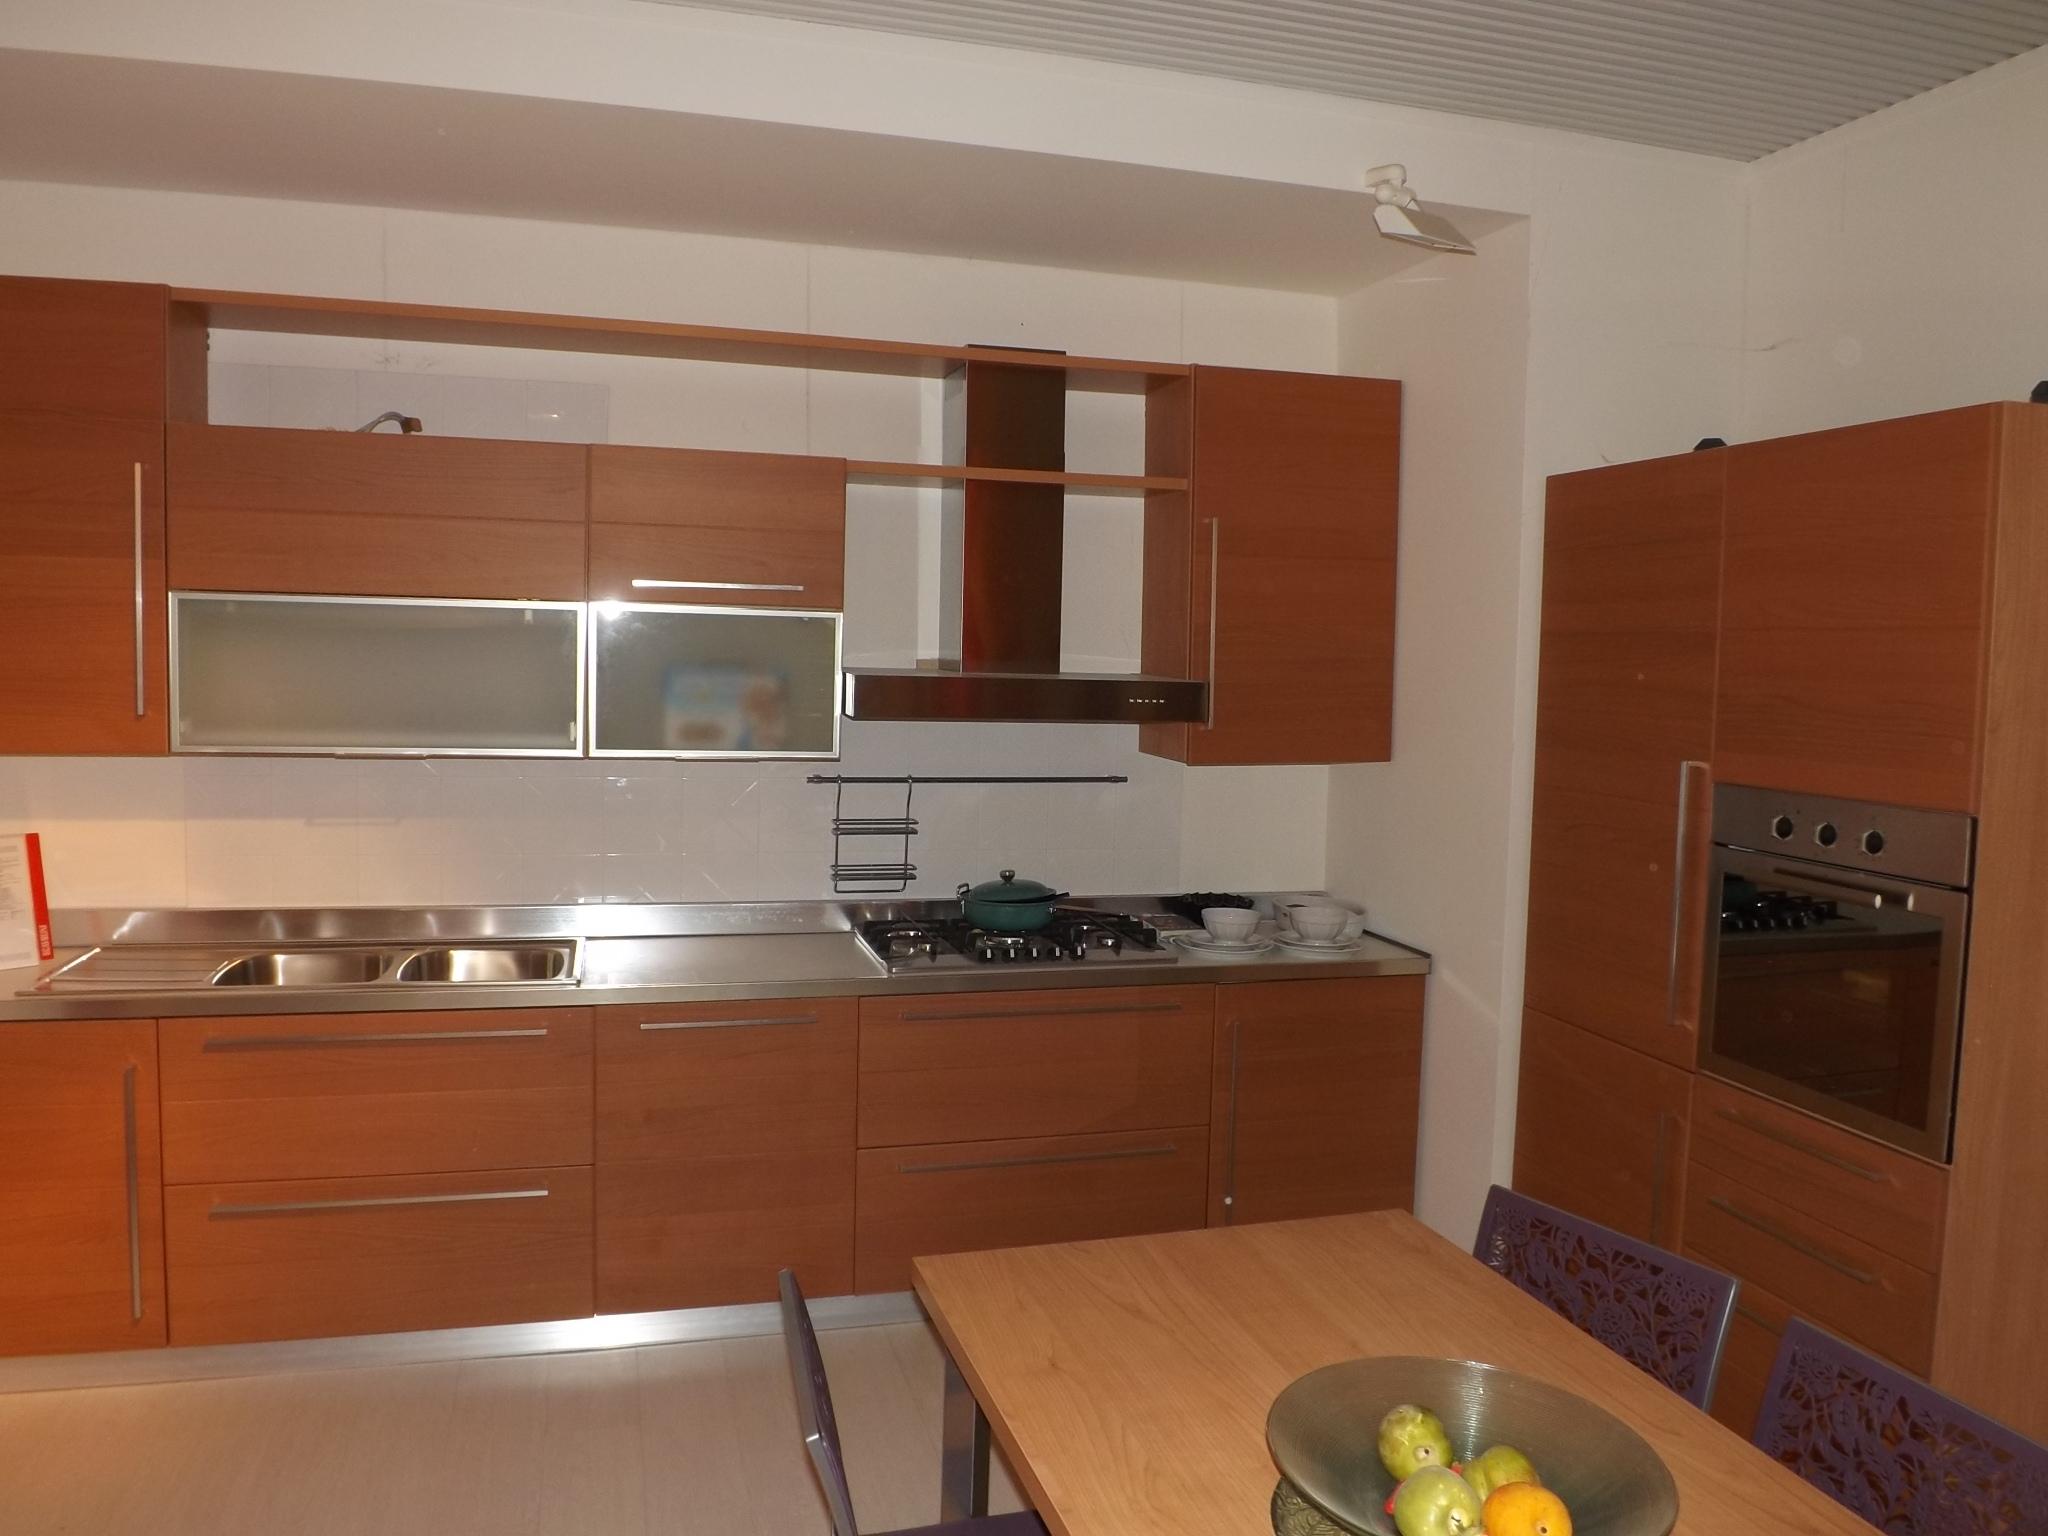 Prezzi Cucine Scavolini Home Happening : Cucina scavolini happening scontato del cucine a